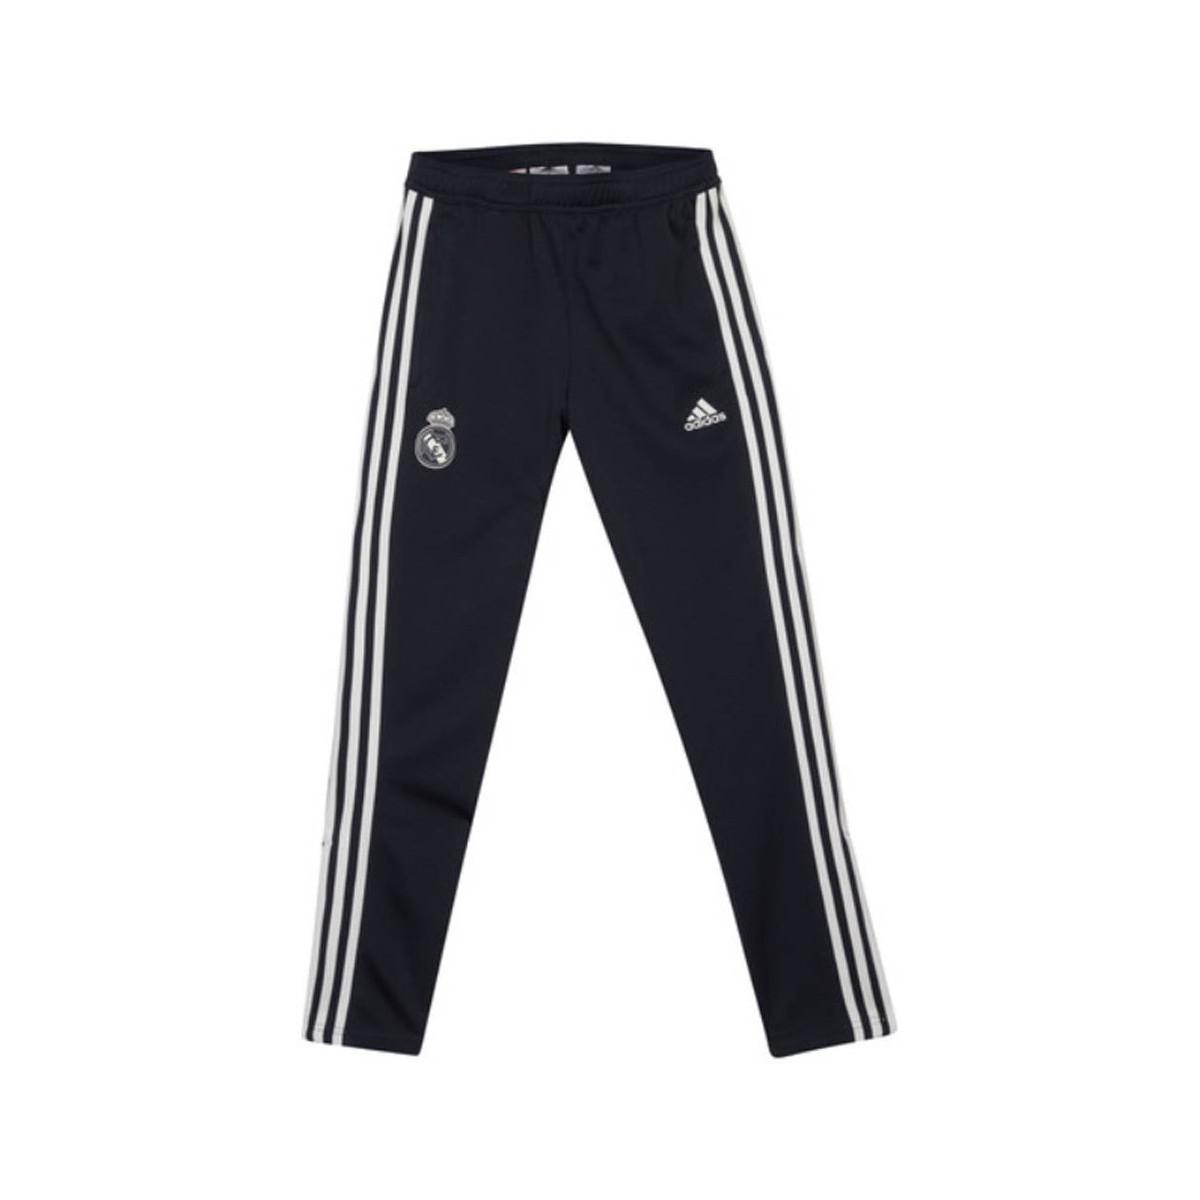 47787fd06 adidas 2018-2019 Real Madrid Training Pants (dark) - Kids Men s ...